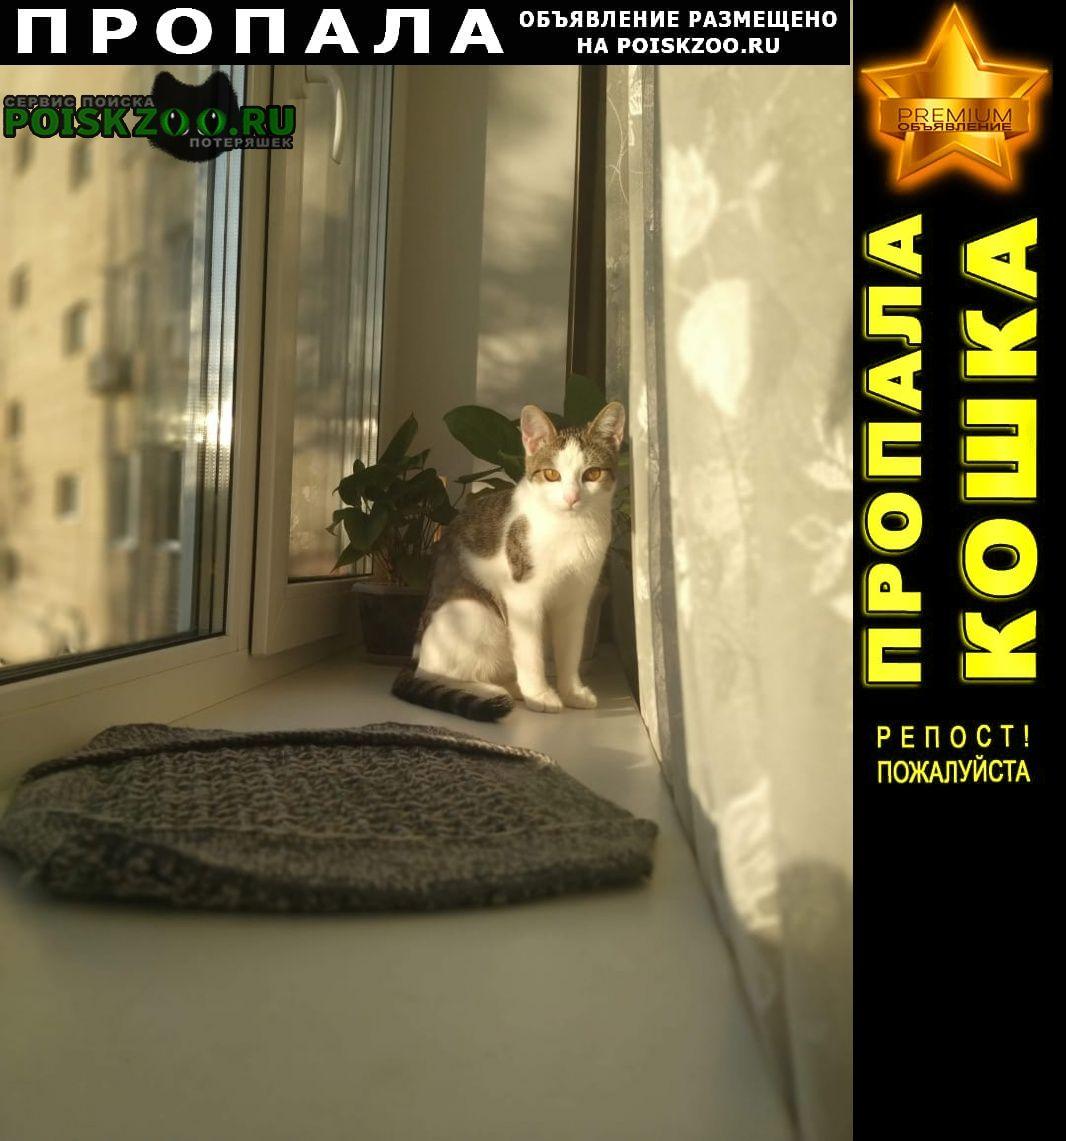 Пропала кошка домашняя. Саратов